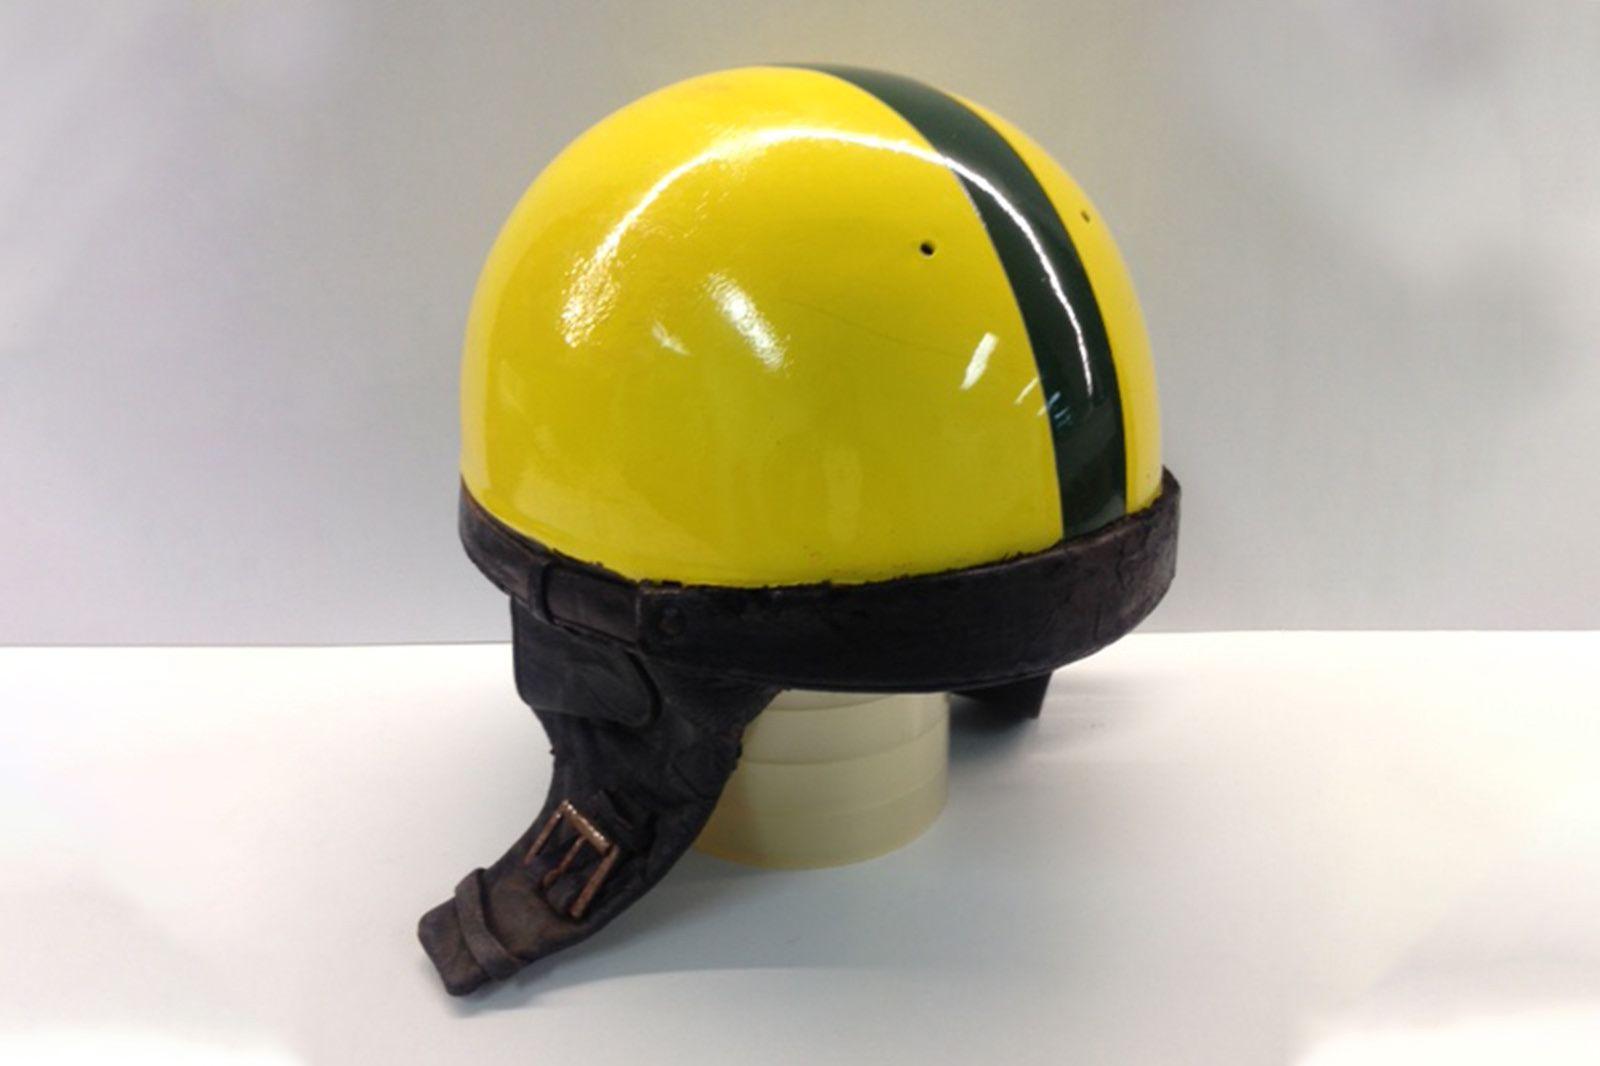 Pudding Bowl Vintage Helmet - Yellow / Green